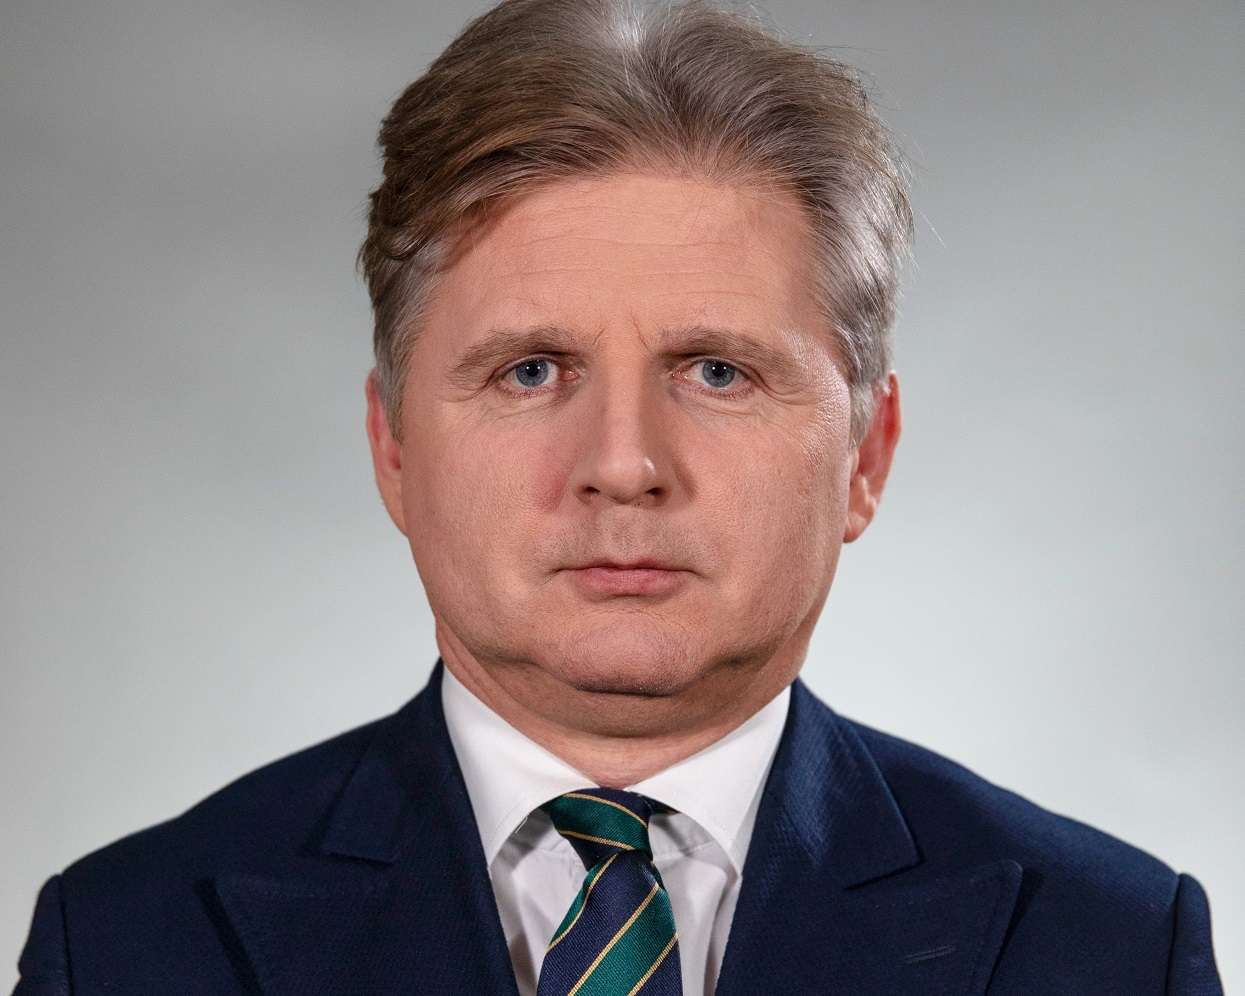 Cezary Kochalski z RPP: Potential Benefits From Polish Negative Rates Are 'Hard' to Spot - Bloomberg